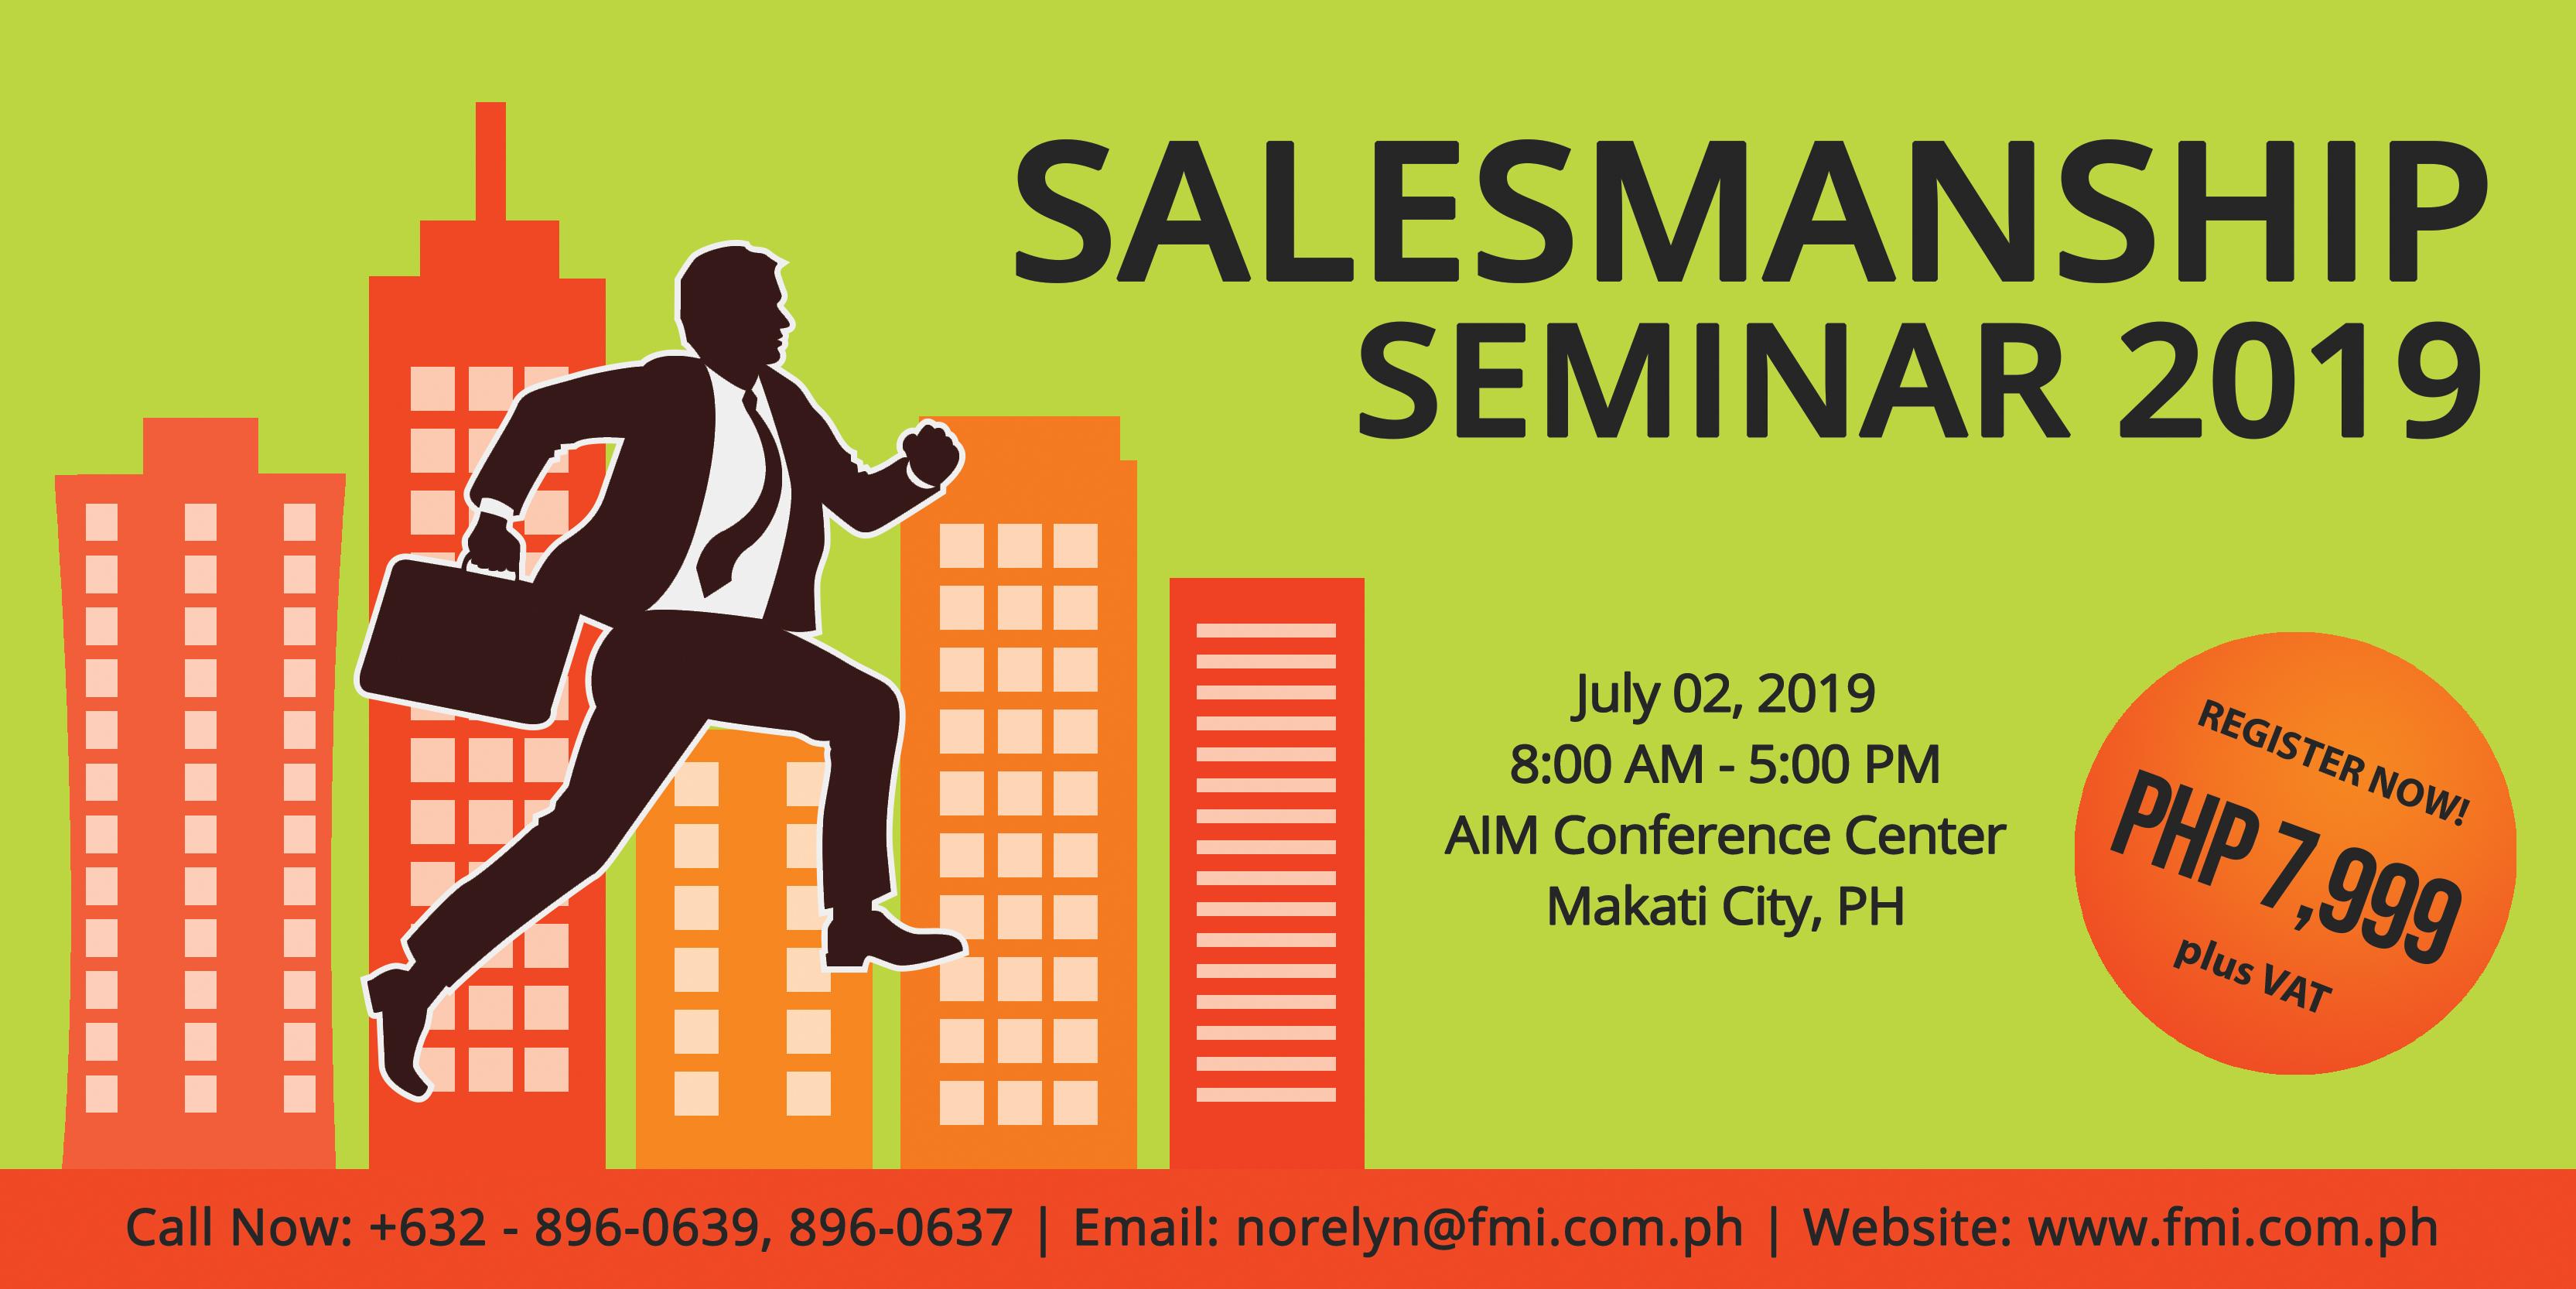 Salesmanship Seminar 2019